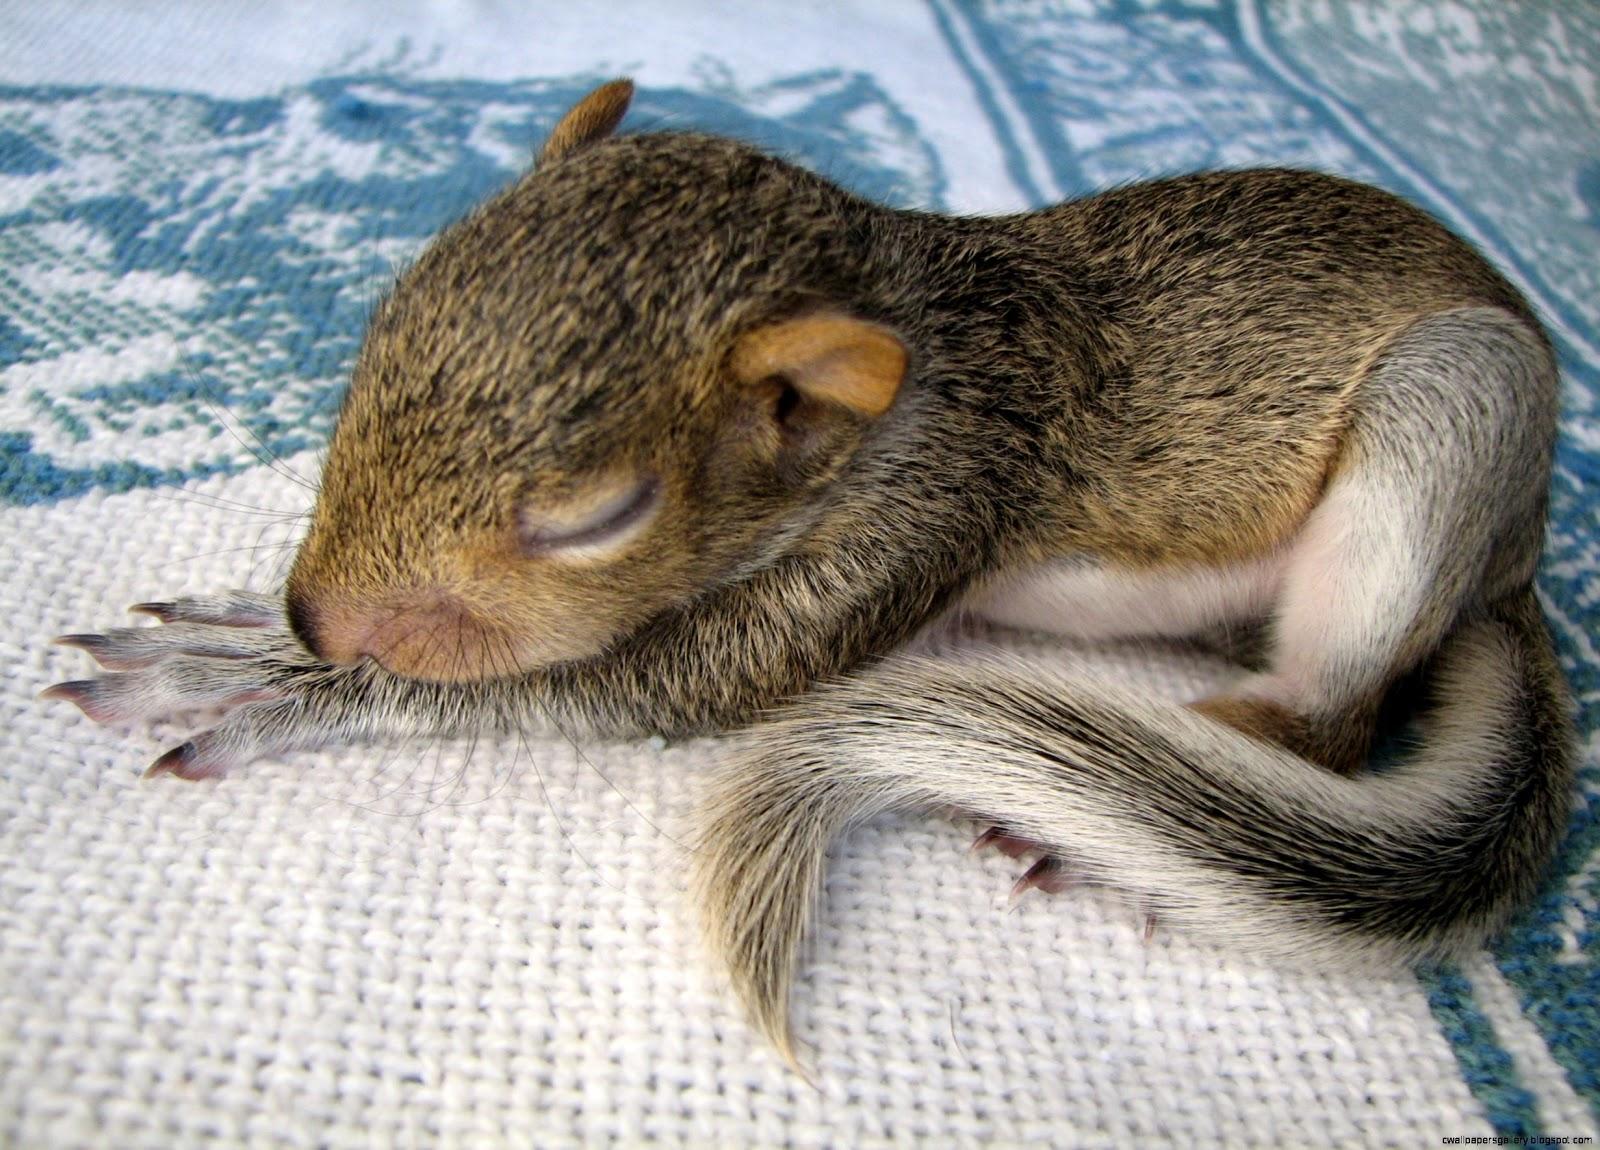 Baby Tree Squirrel | www.imgkid.com - The Image Kid Has It!